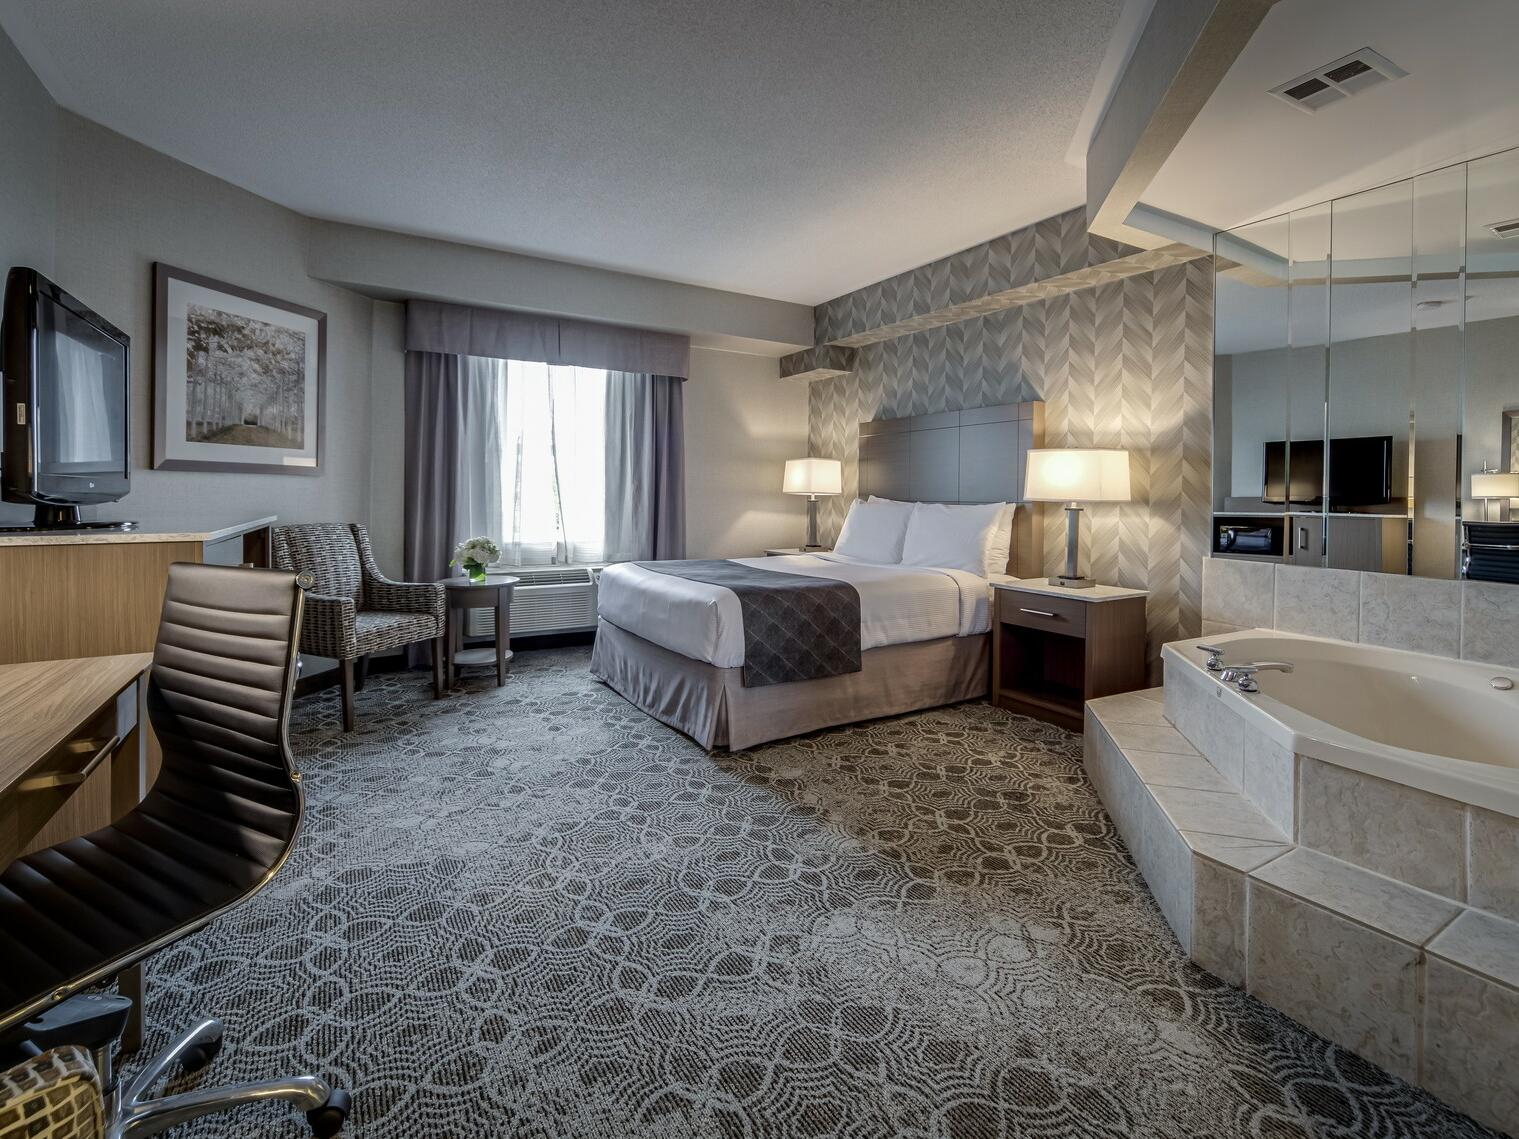 Queen Jacuzzi Suite - Monte Carlo Inn Toronto Markham